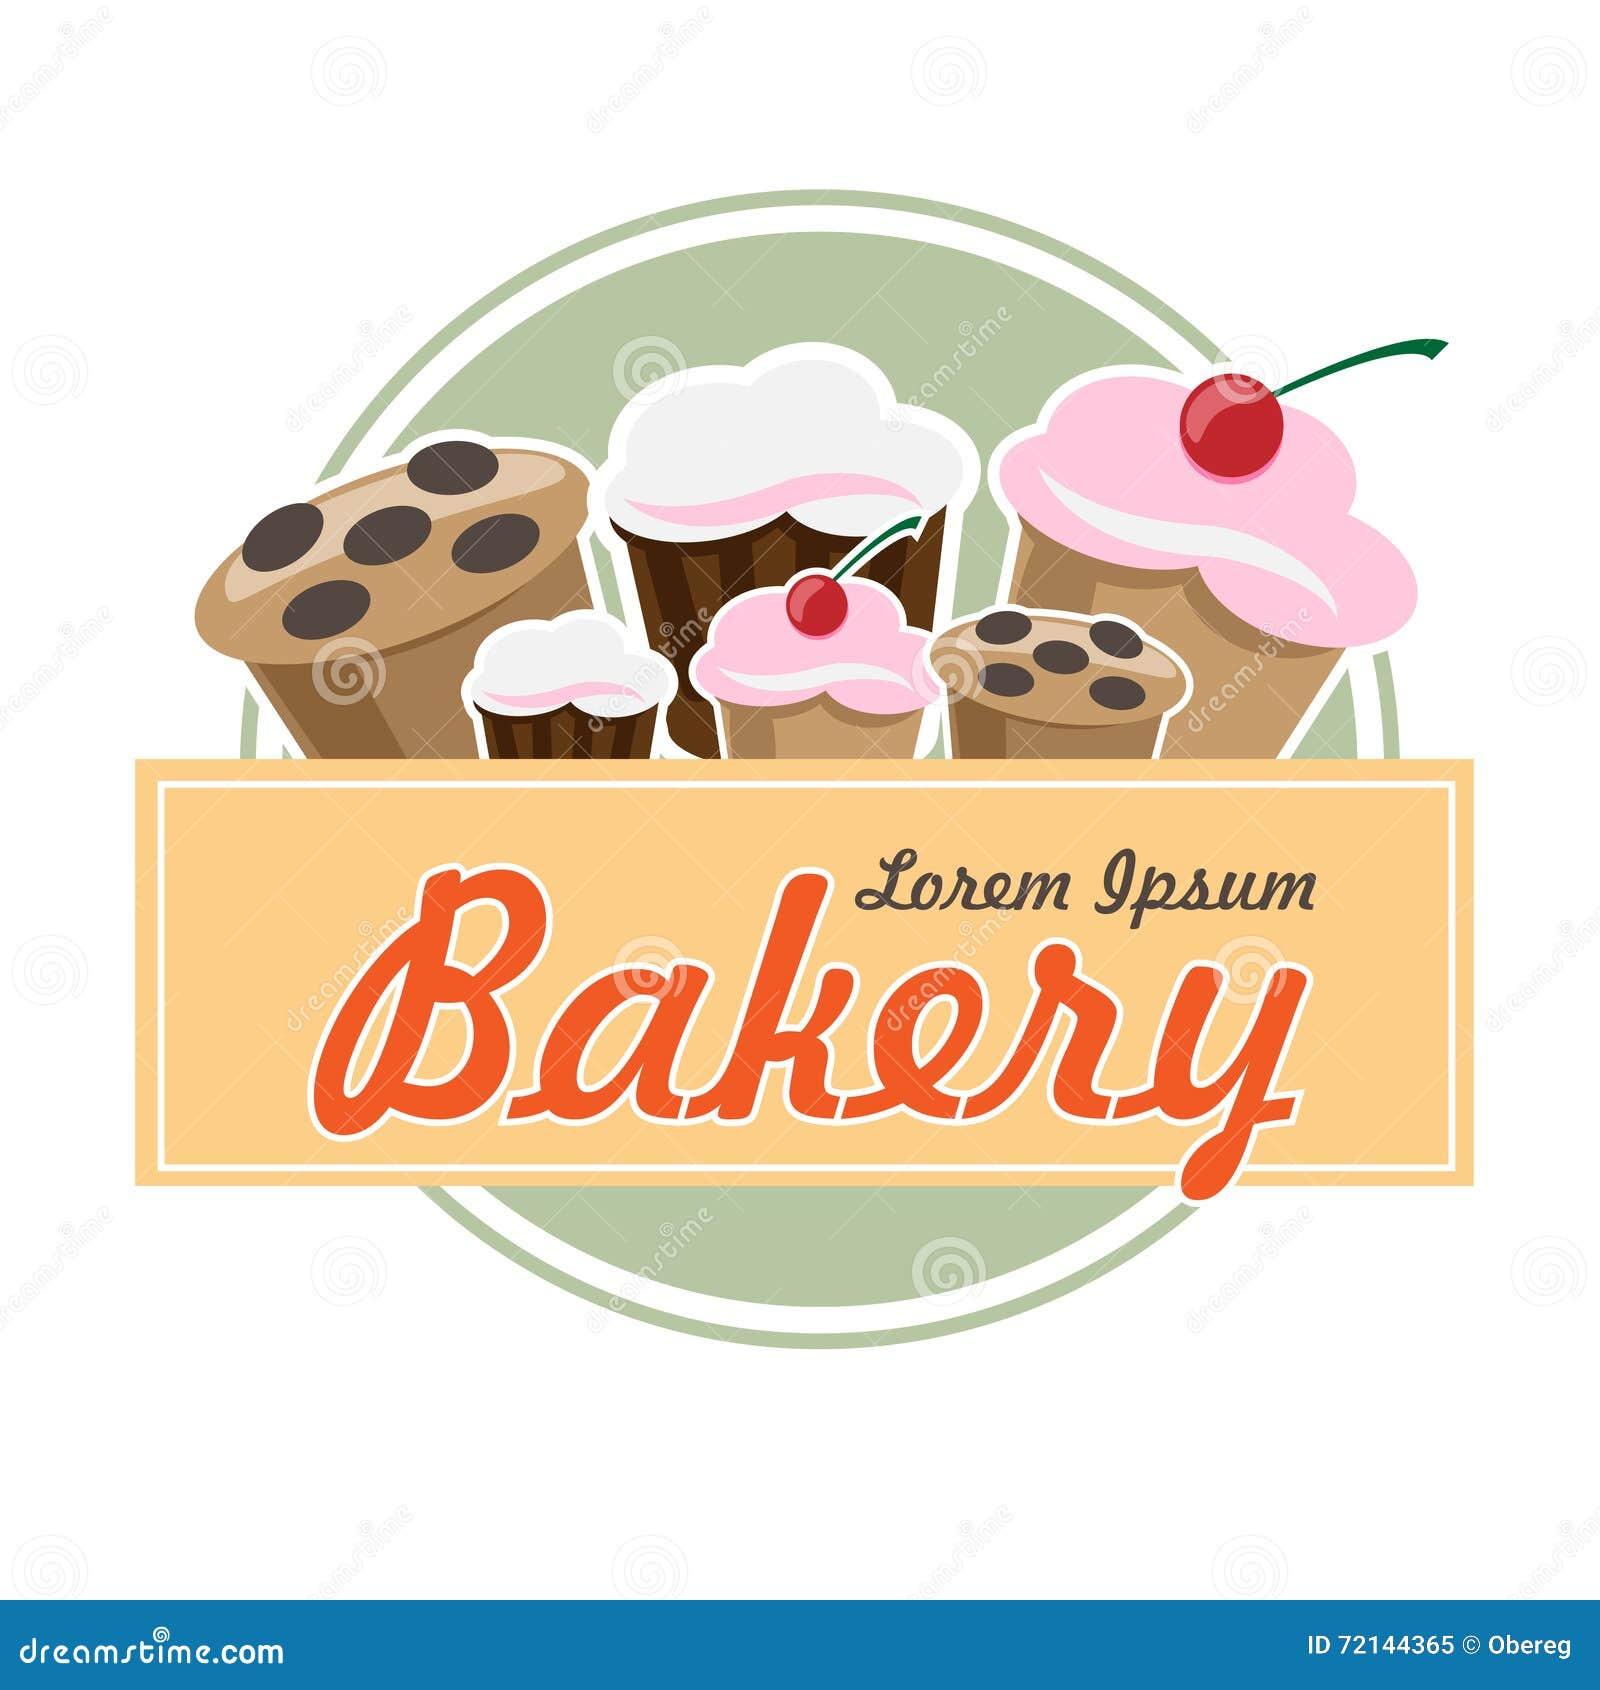 bake shop business plan philippines logo